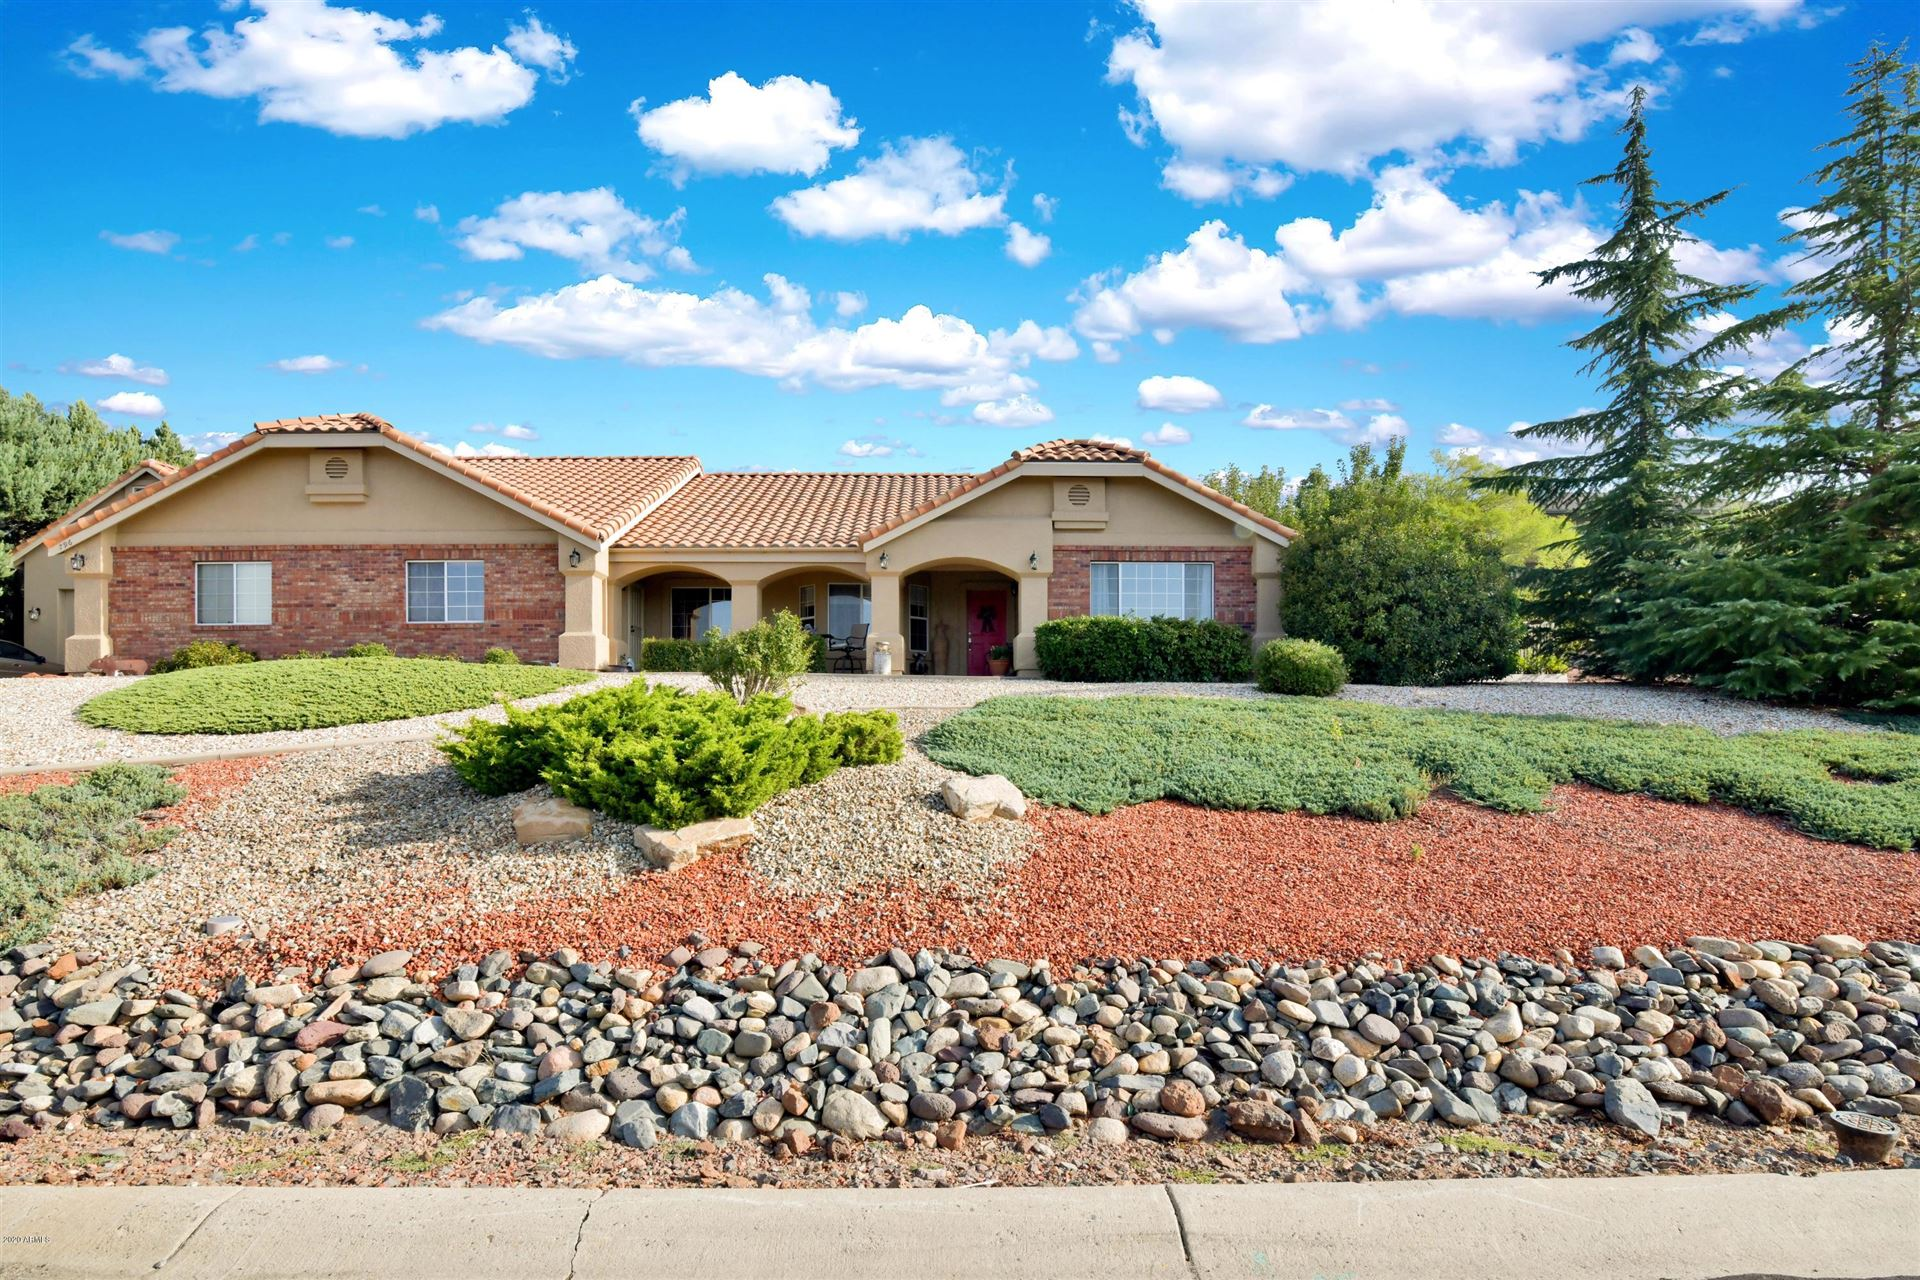 796 GOLDEN HAWK Drive, Prescott, AZ 86301 - #: 6115869